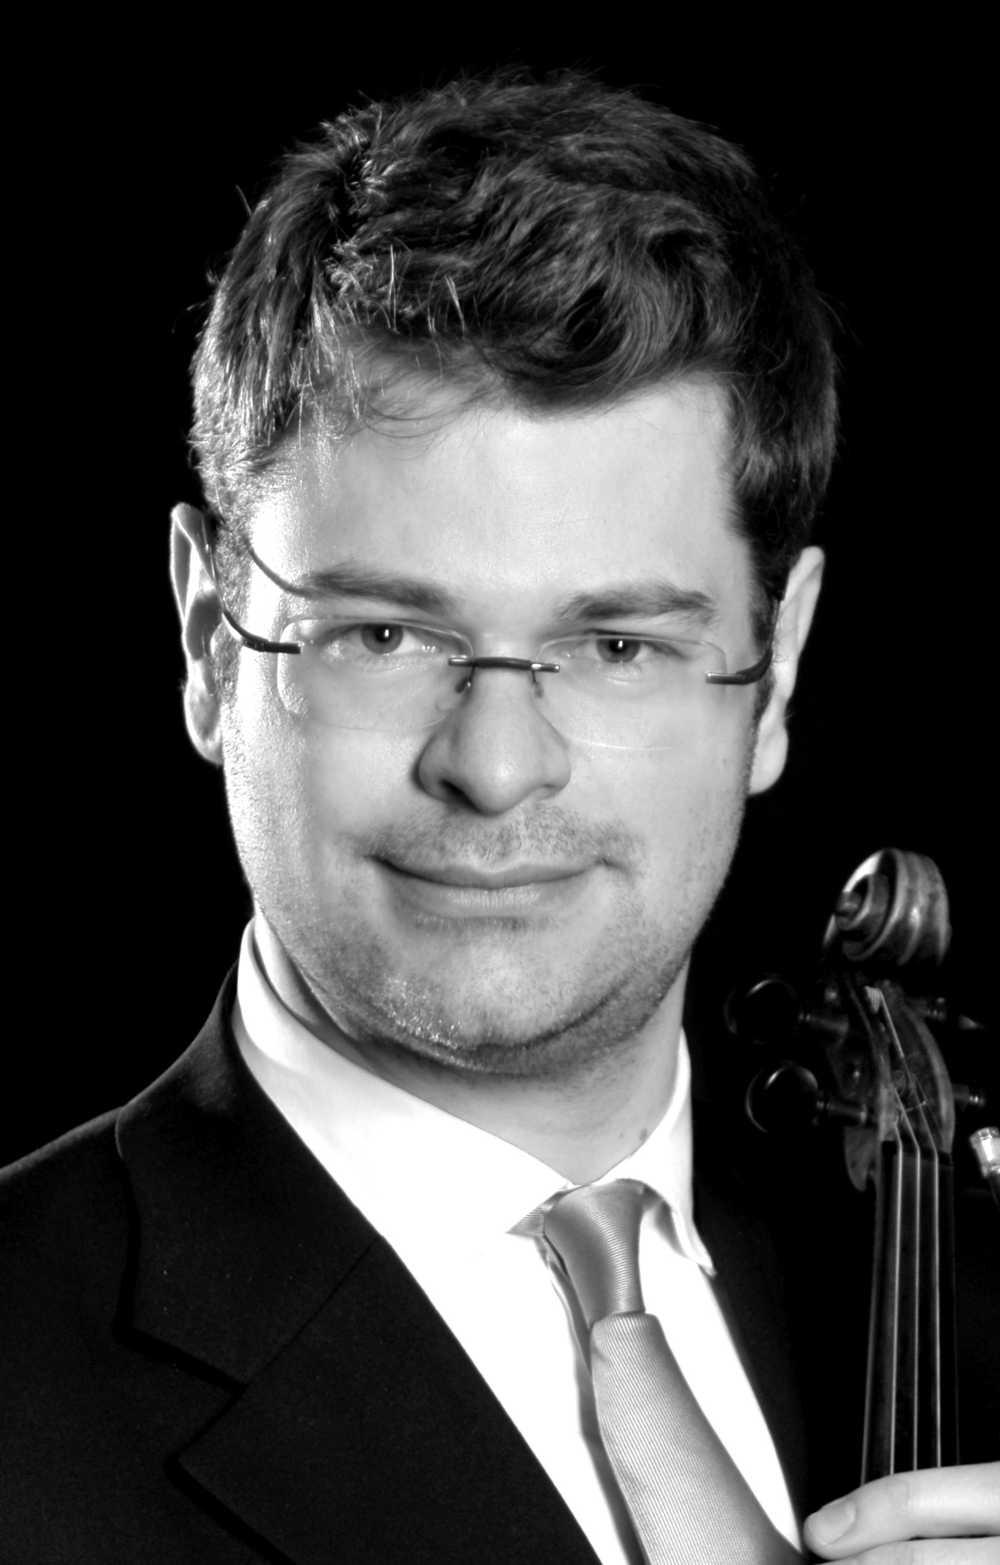 Dr. Fabian Rieser (Violin)